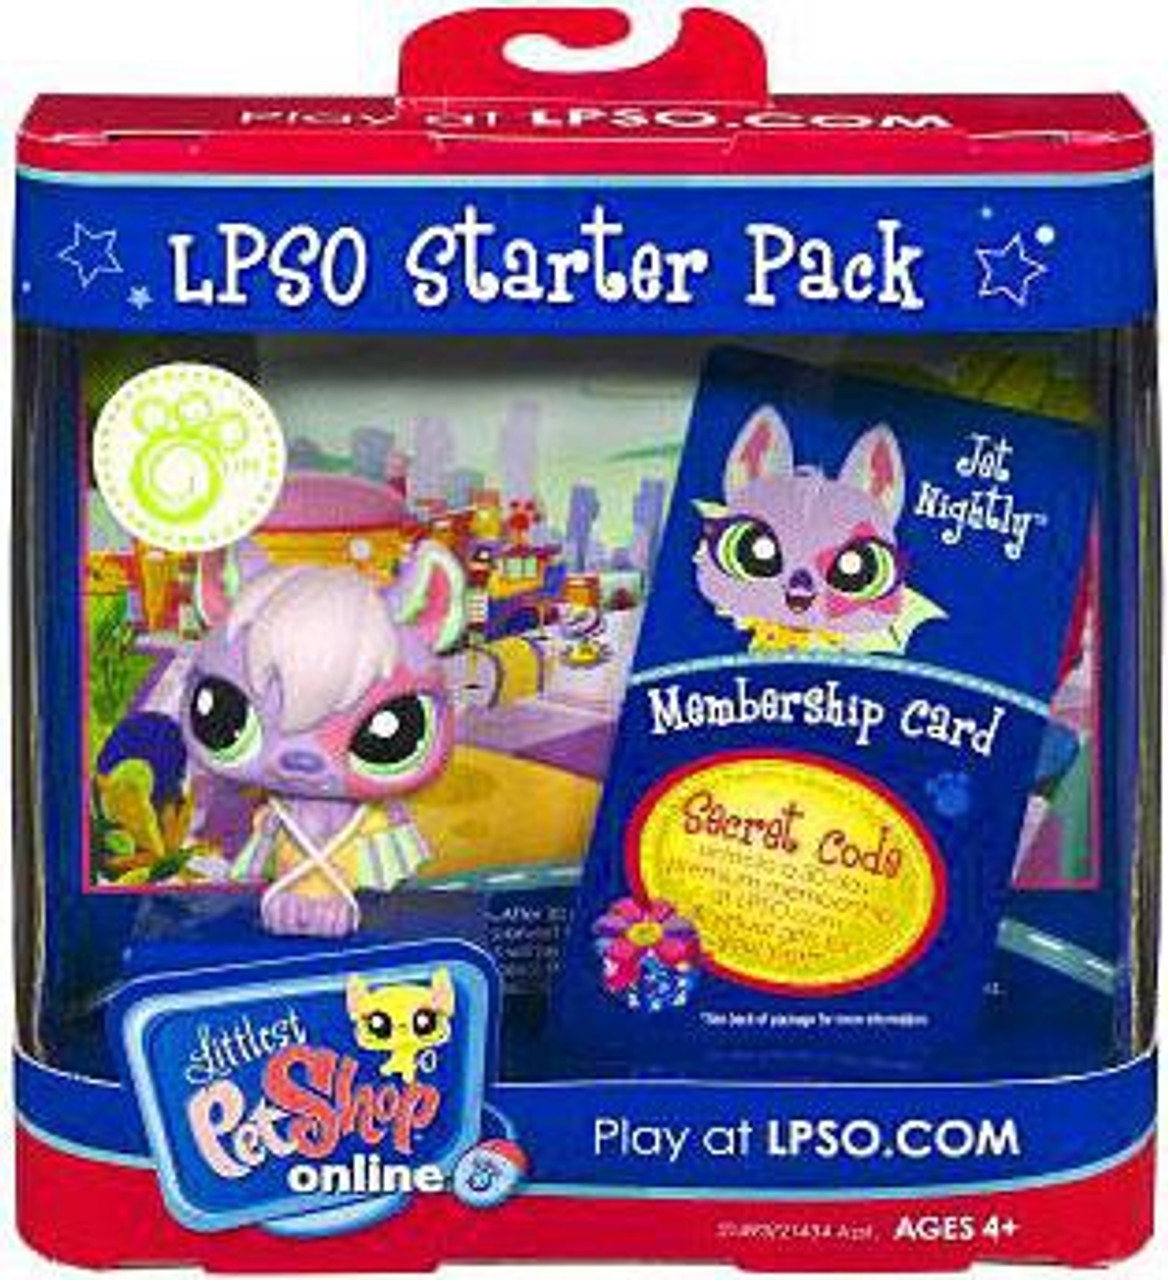 Littlest Pet Shop Online LPSO Starter Pack Jet Nightly Figure [Bat]